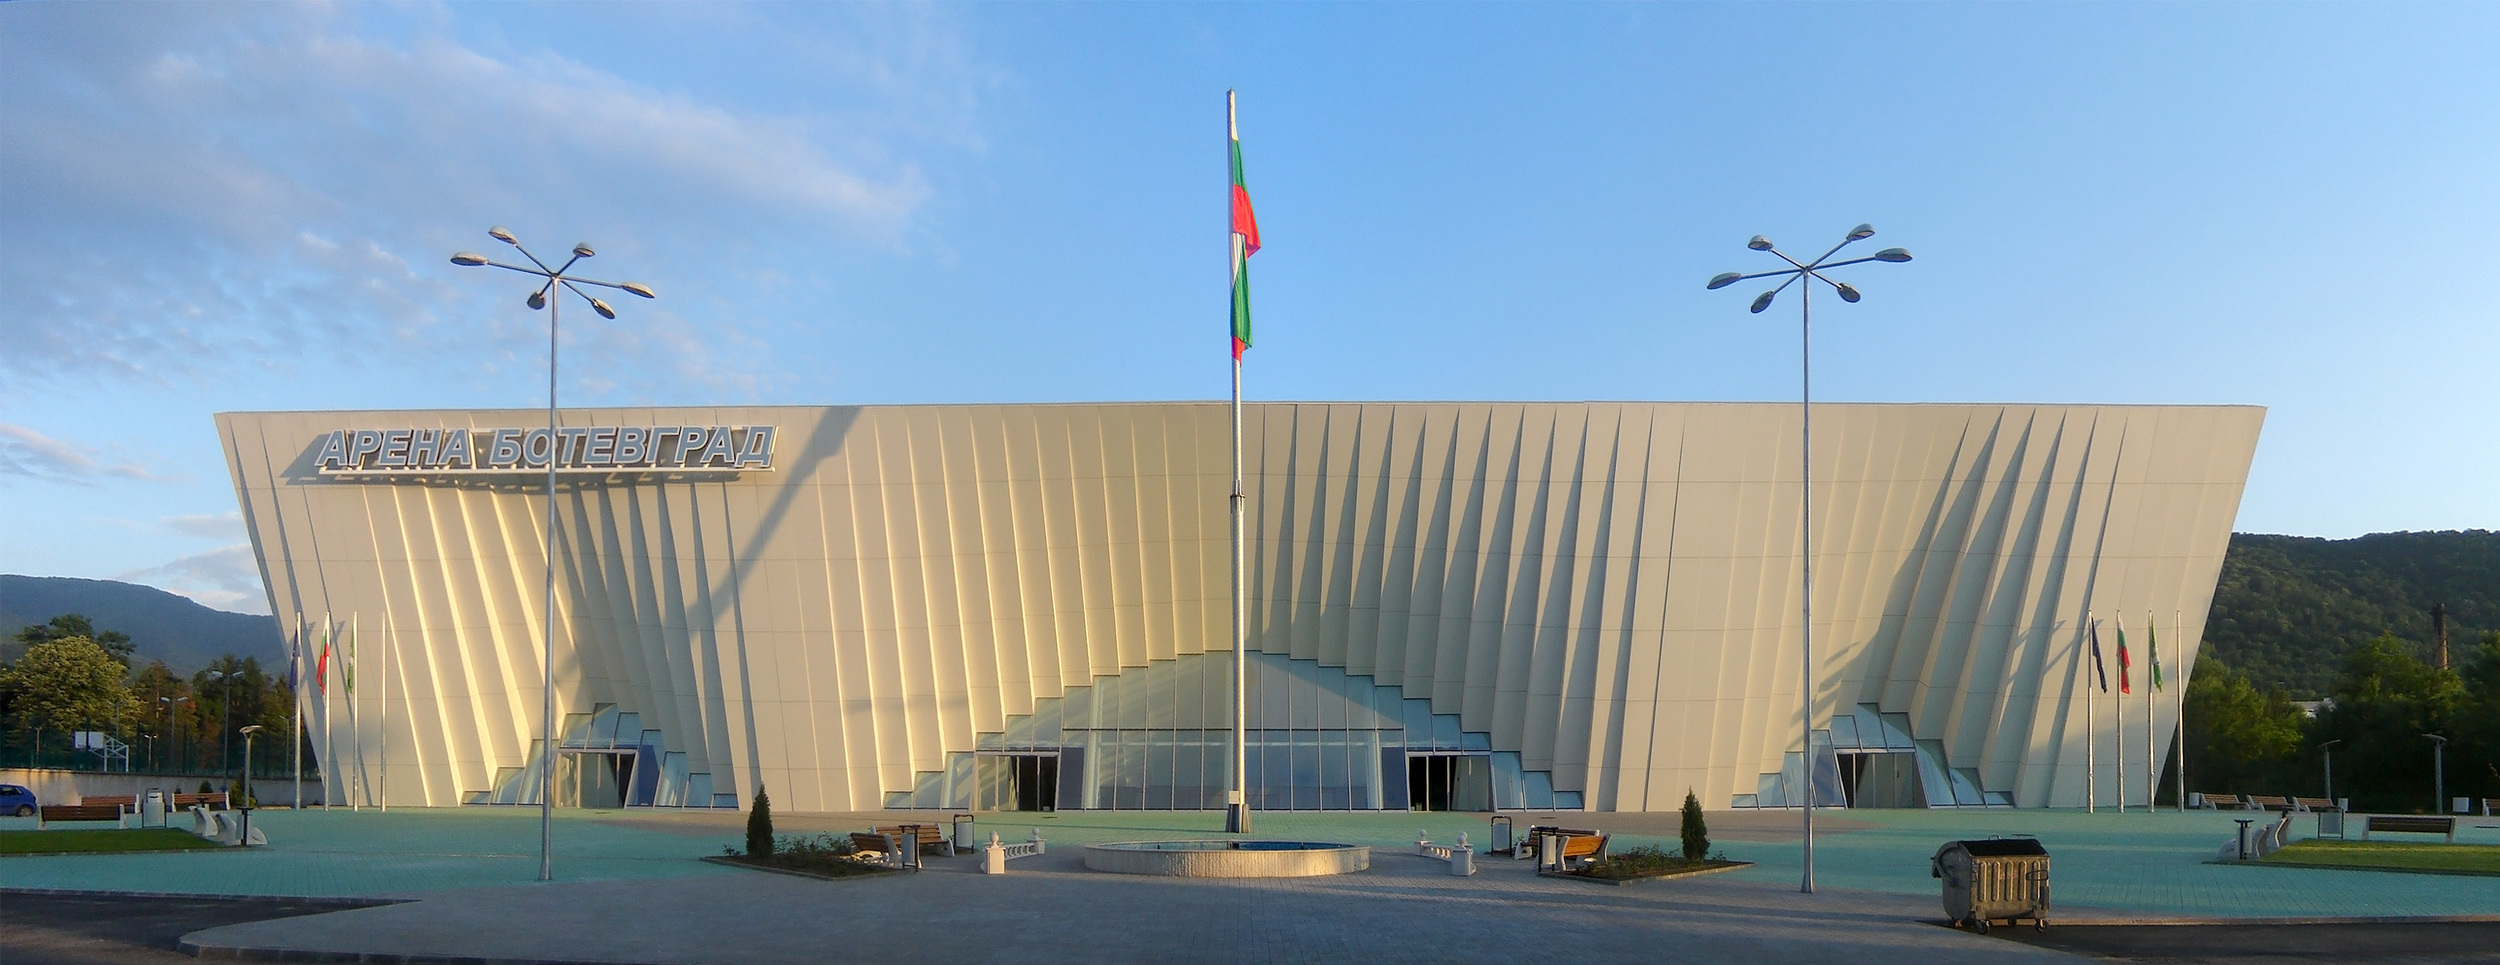 The teams will do battle in the Botevgrad Arena Sports Palace in Botevgrad, Bulgaria Photo: Wikipedia